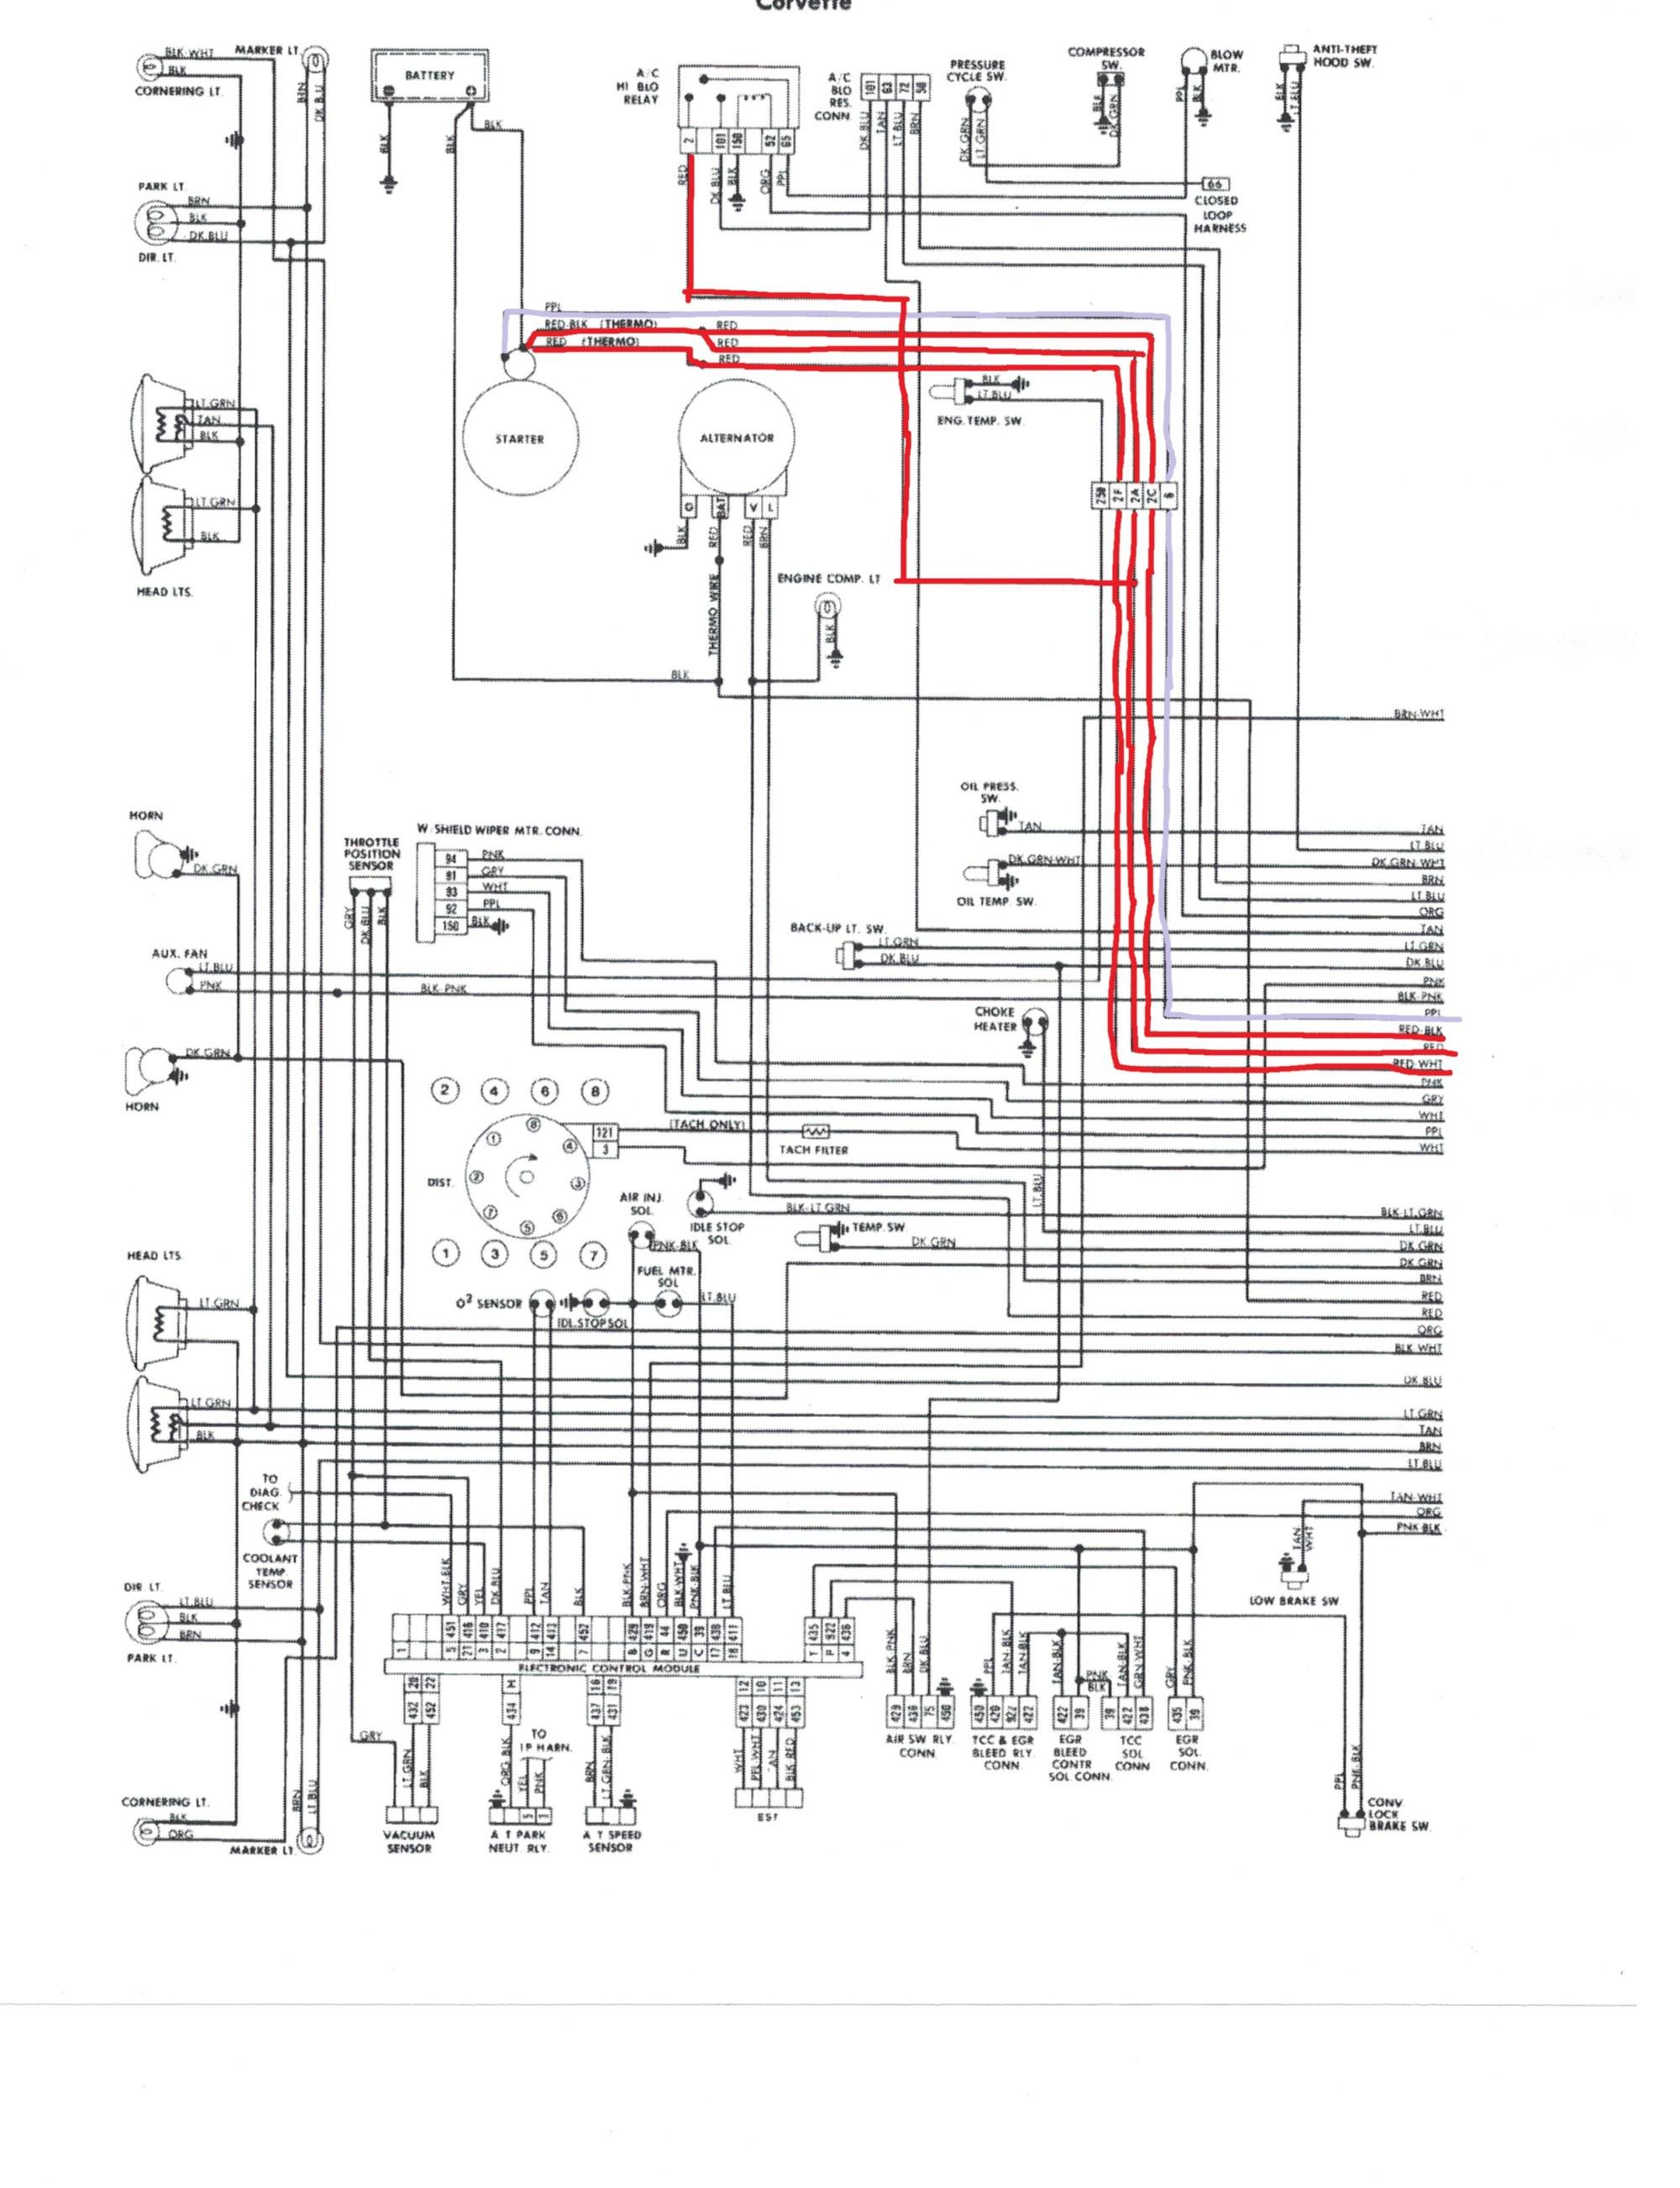 hight resolution of  1977 1981 starter wiring corvetteforum chevrolet corvette forum on 1969 corvette starter